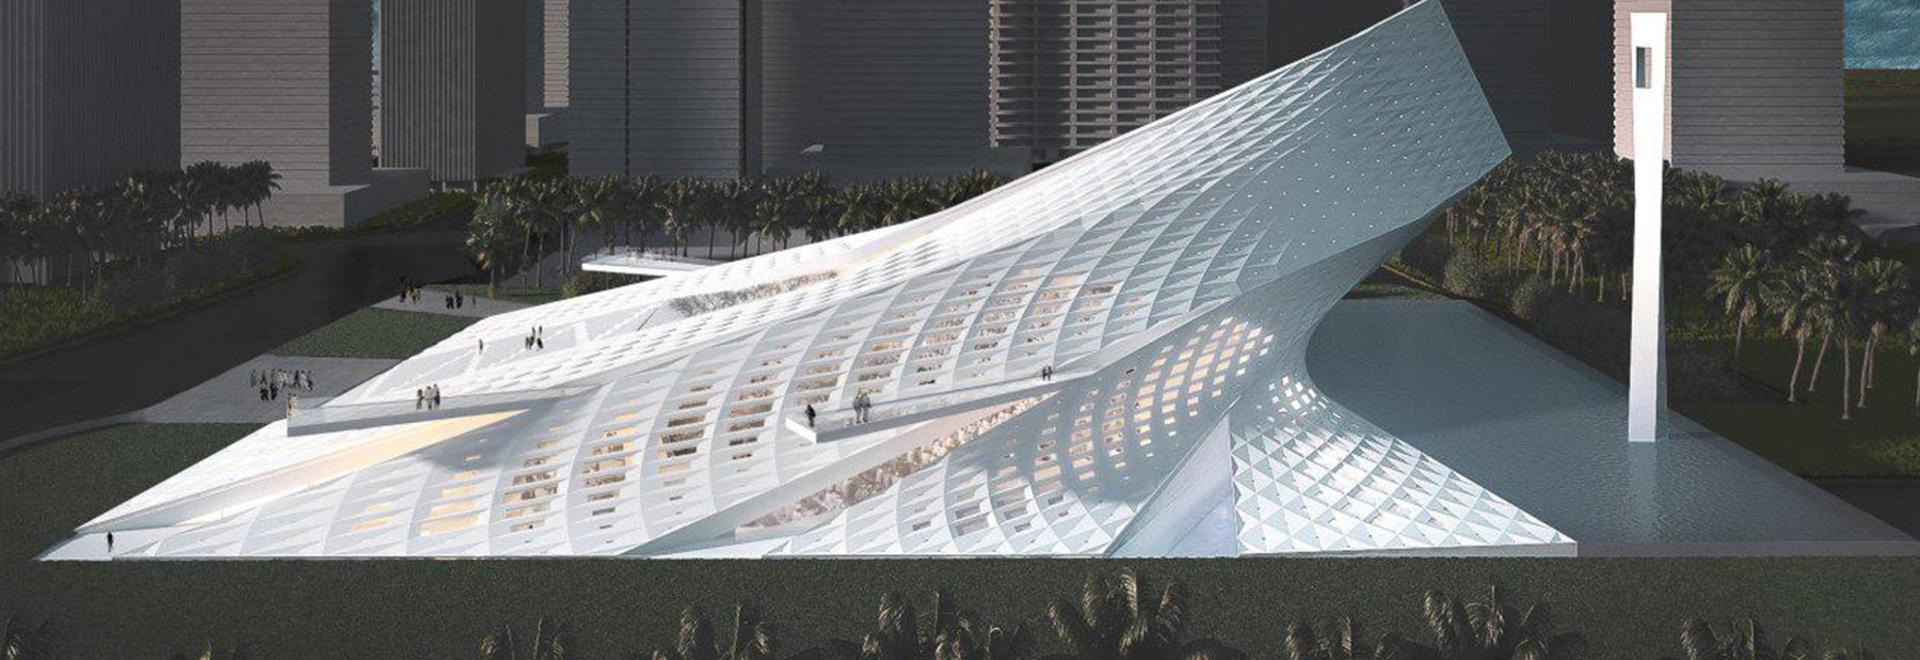 QASTIC draws on the spiritual nature of light for dubai creek harbor mosque proposal